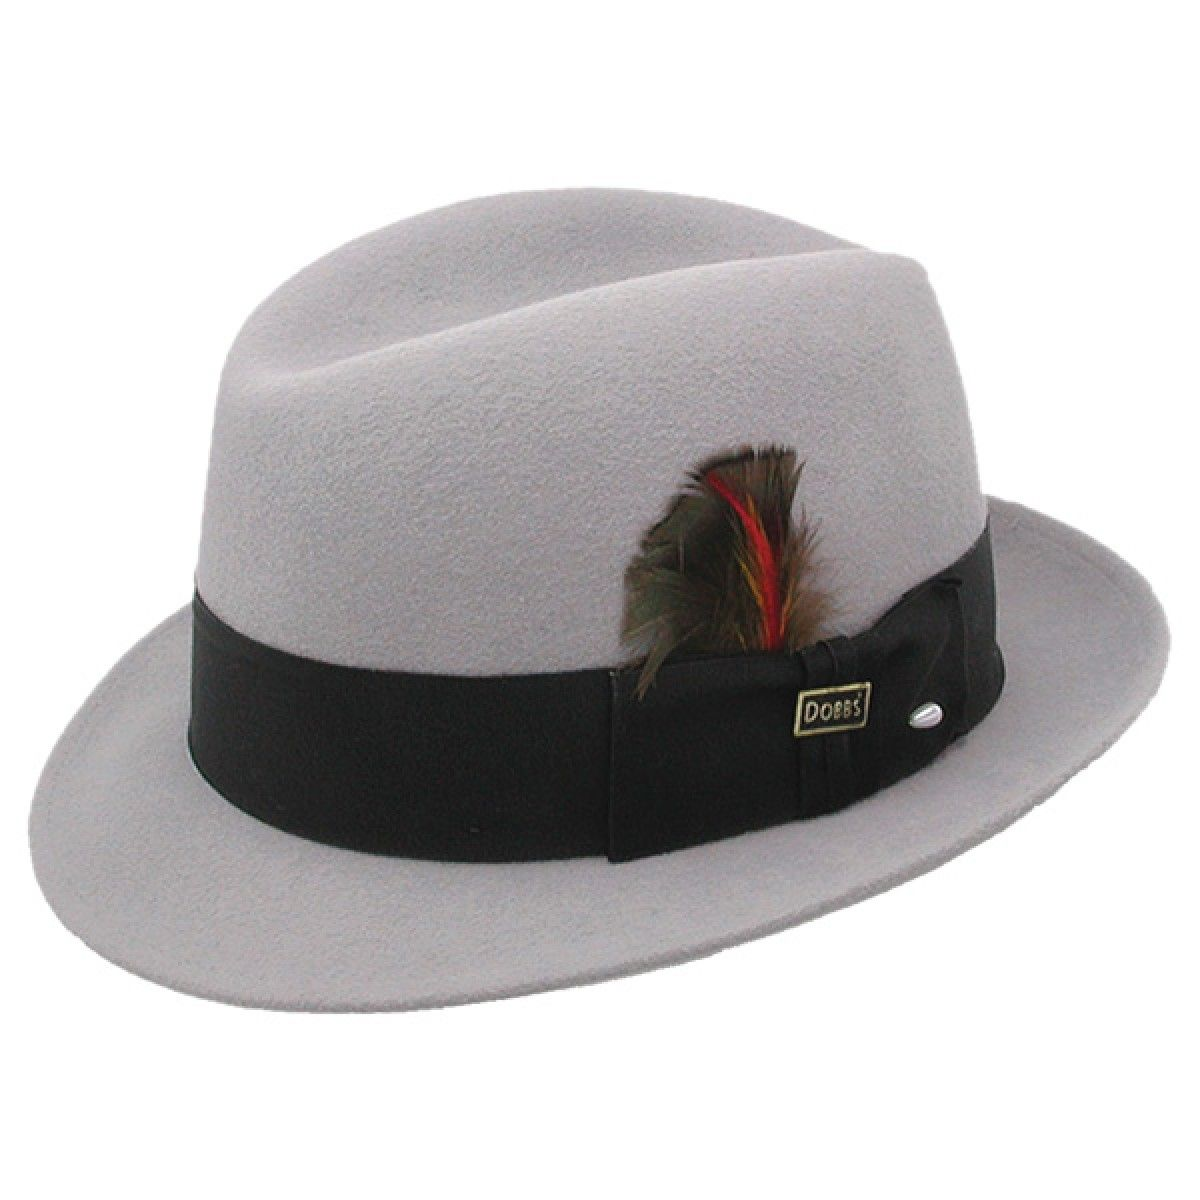 230e0d90ea0fe Cozy Dobbs Randall - Wool Fedora dobbs hats